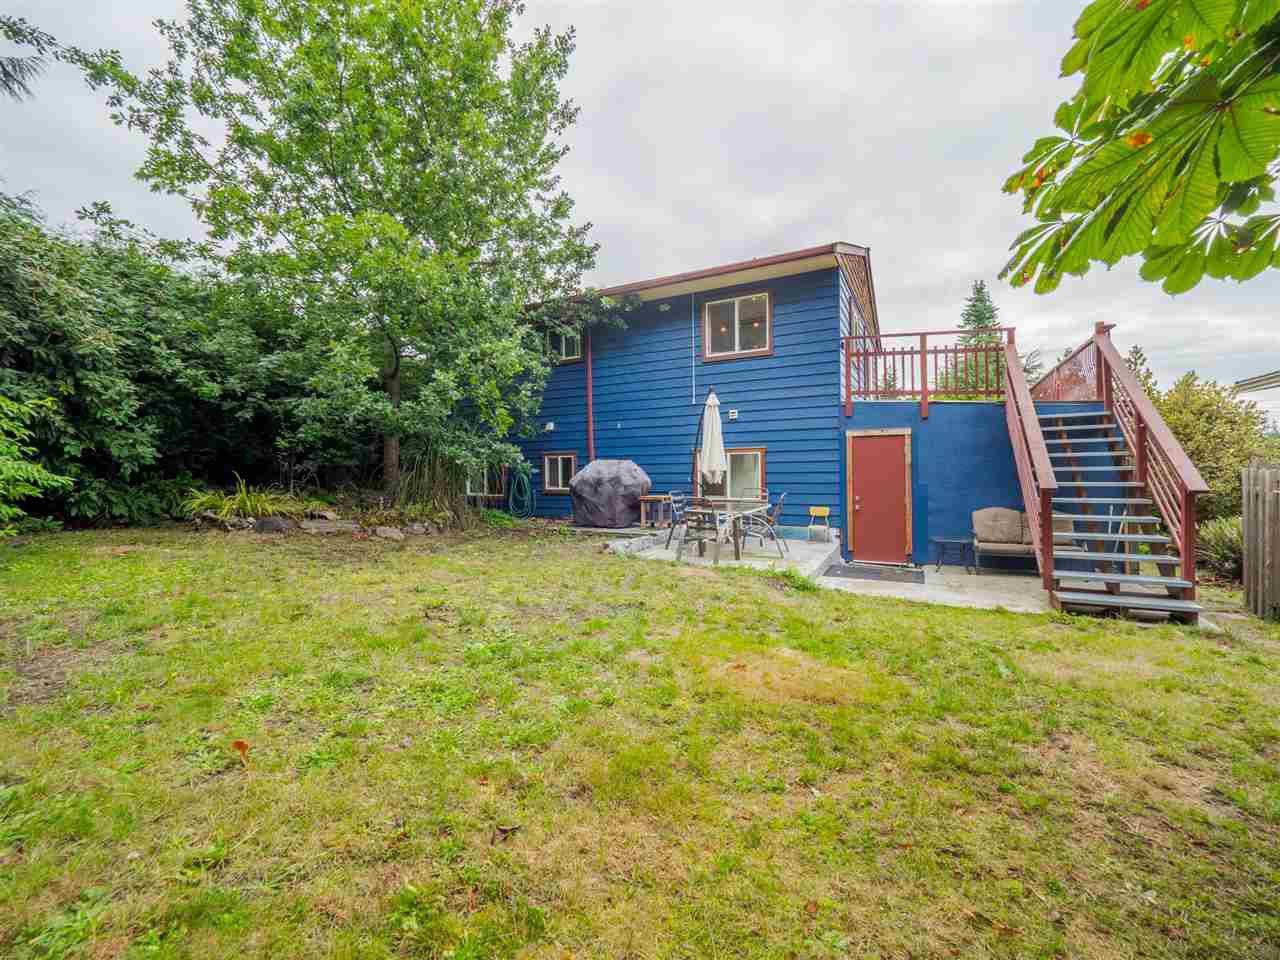 Main Photo: 5449 DERBY Road in Sechelt: Sechelt District House for sale (Sunshine Coast)  : MLS®# R2407433